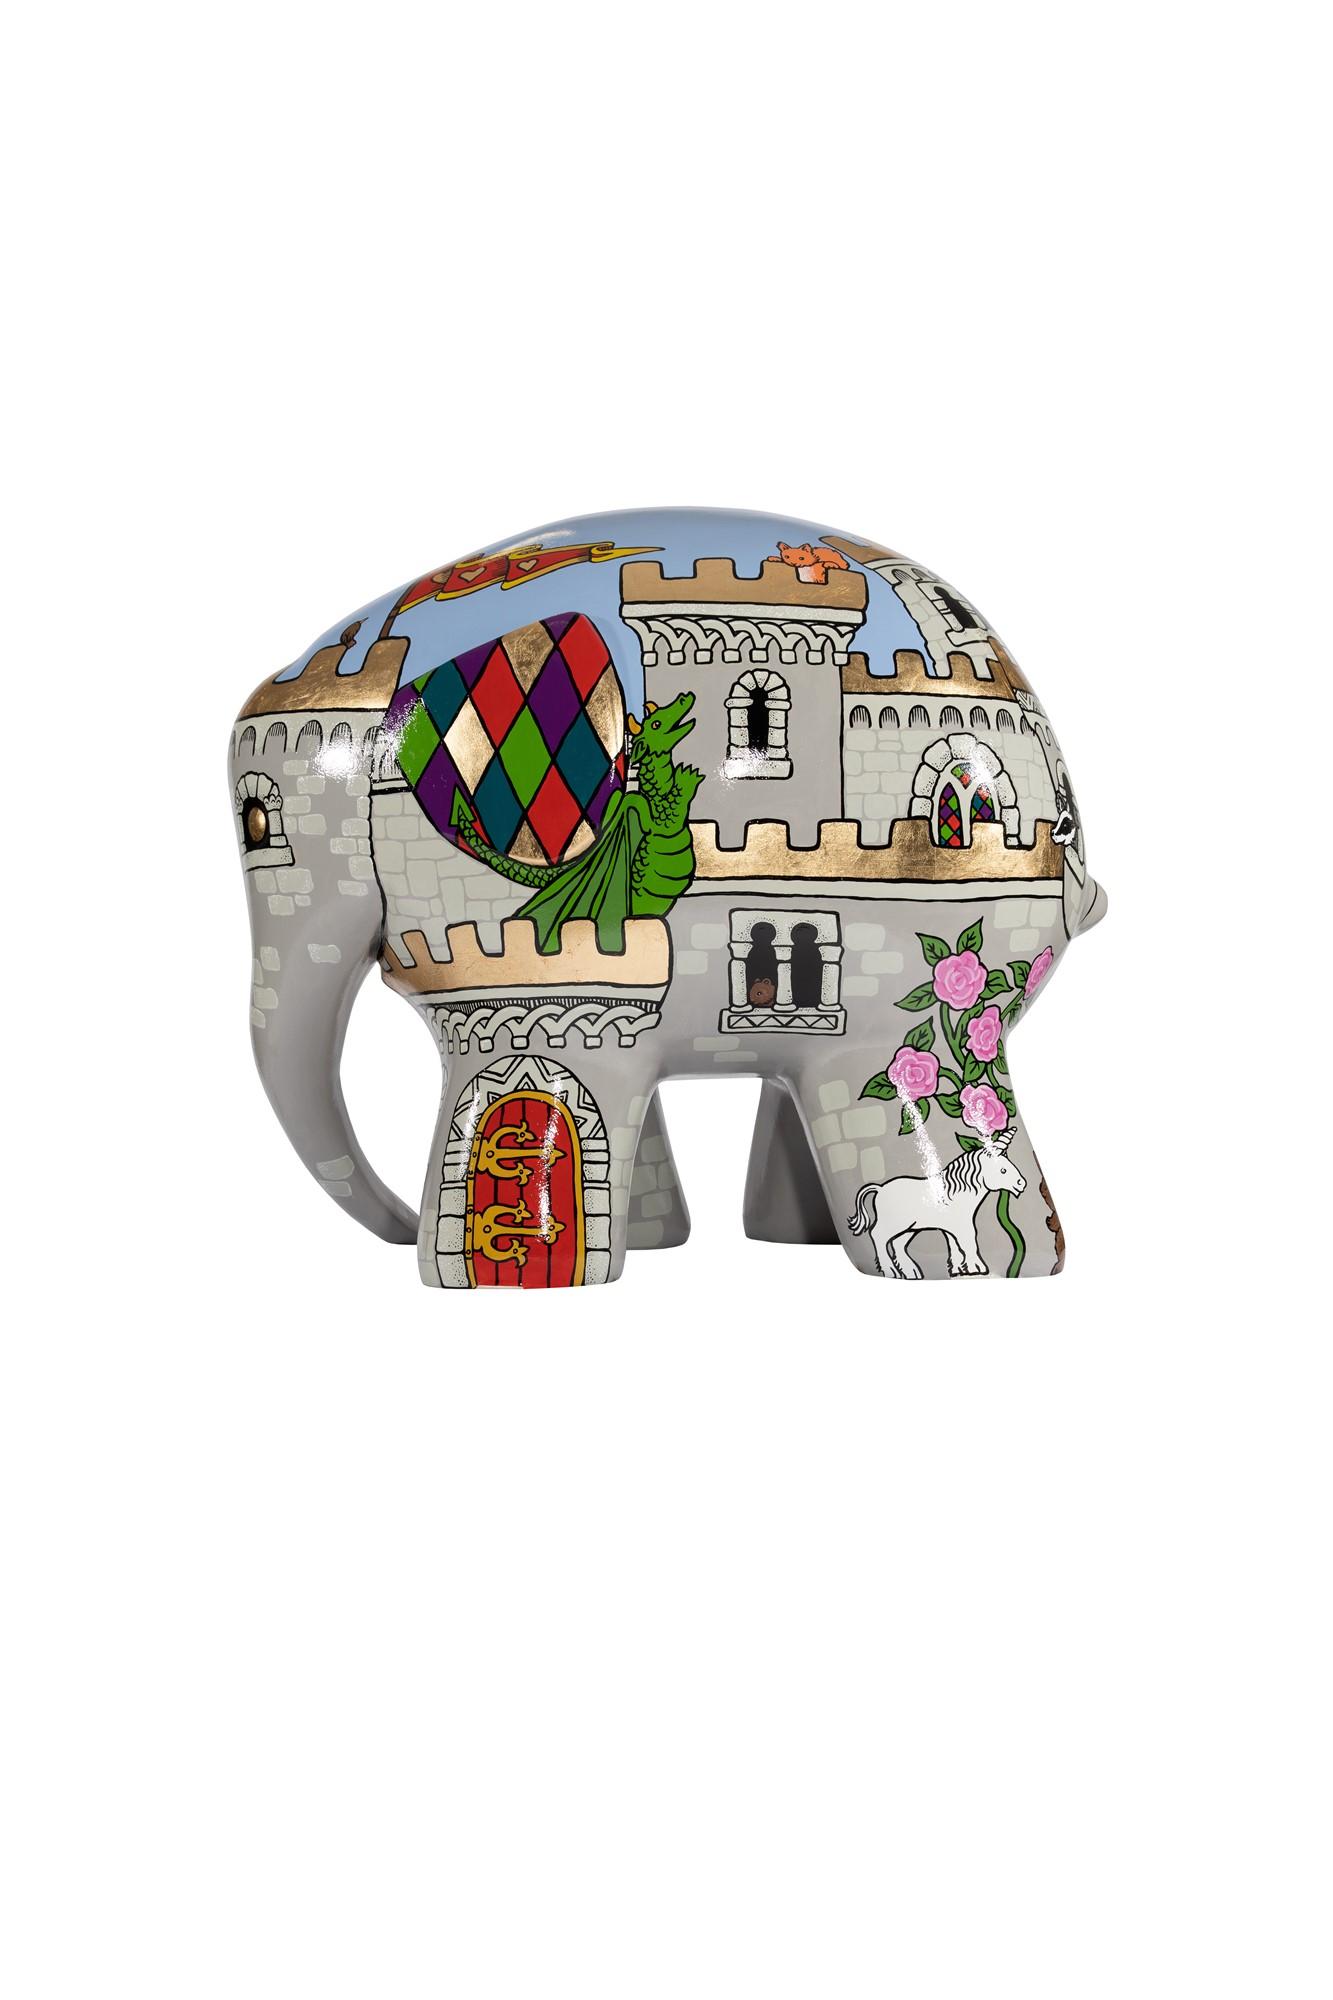 Lot 3 - The Elephant's New Castle